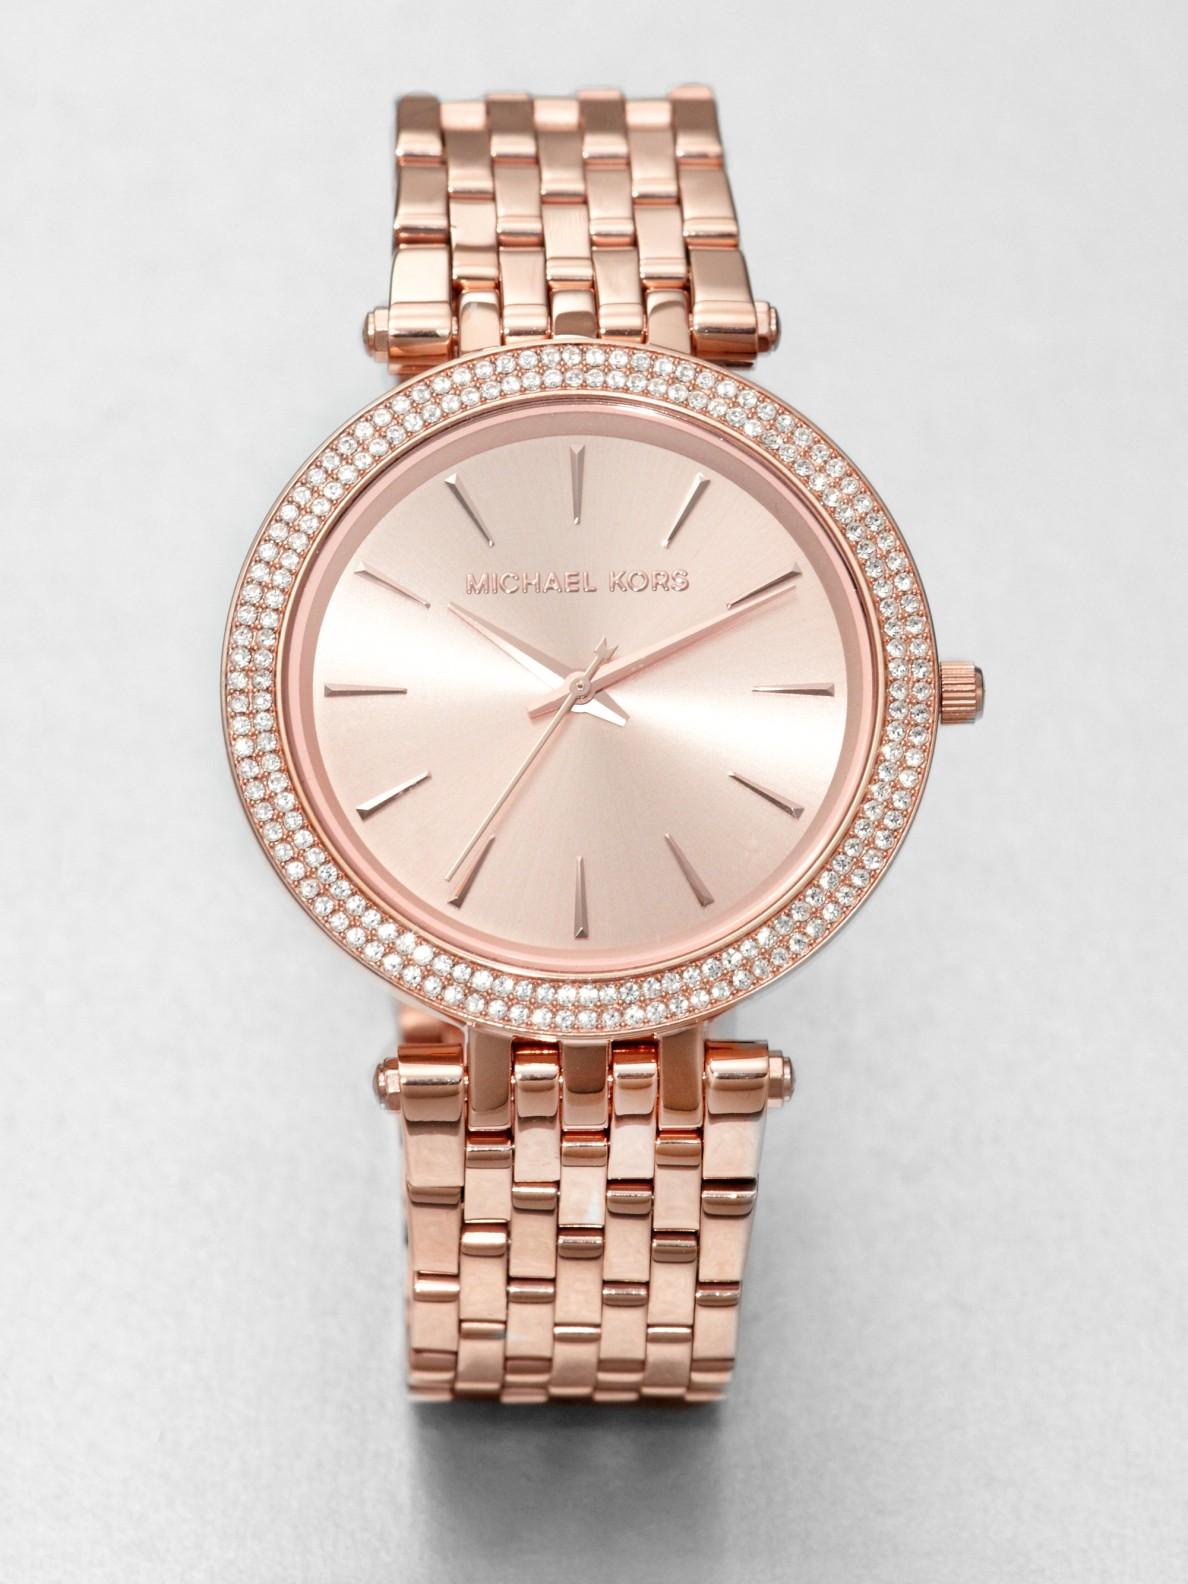 Michael Kors Rose Gold Watch With Rhinestones